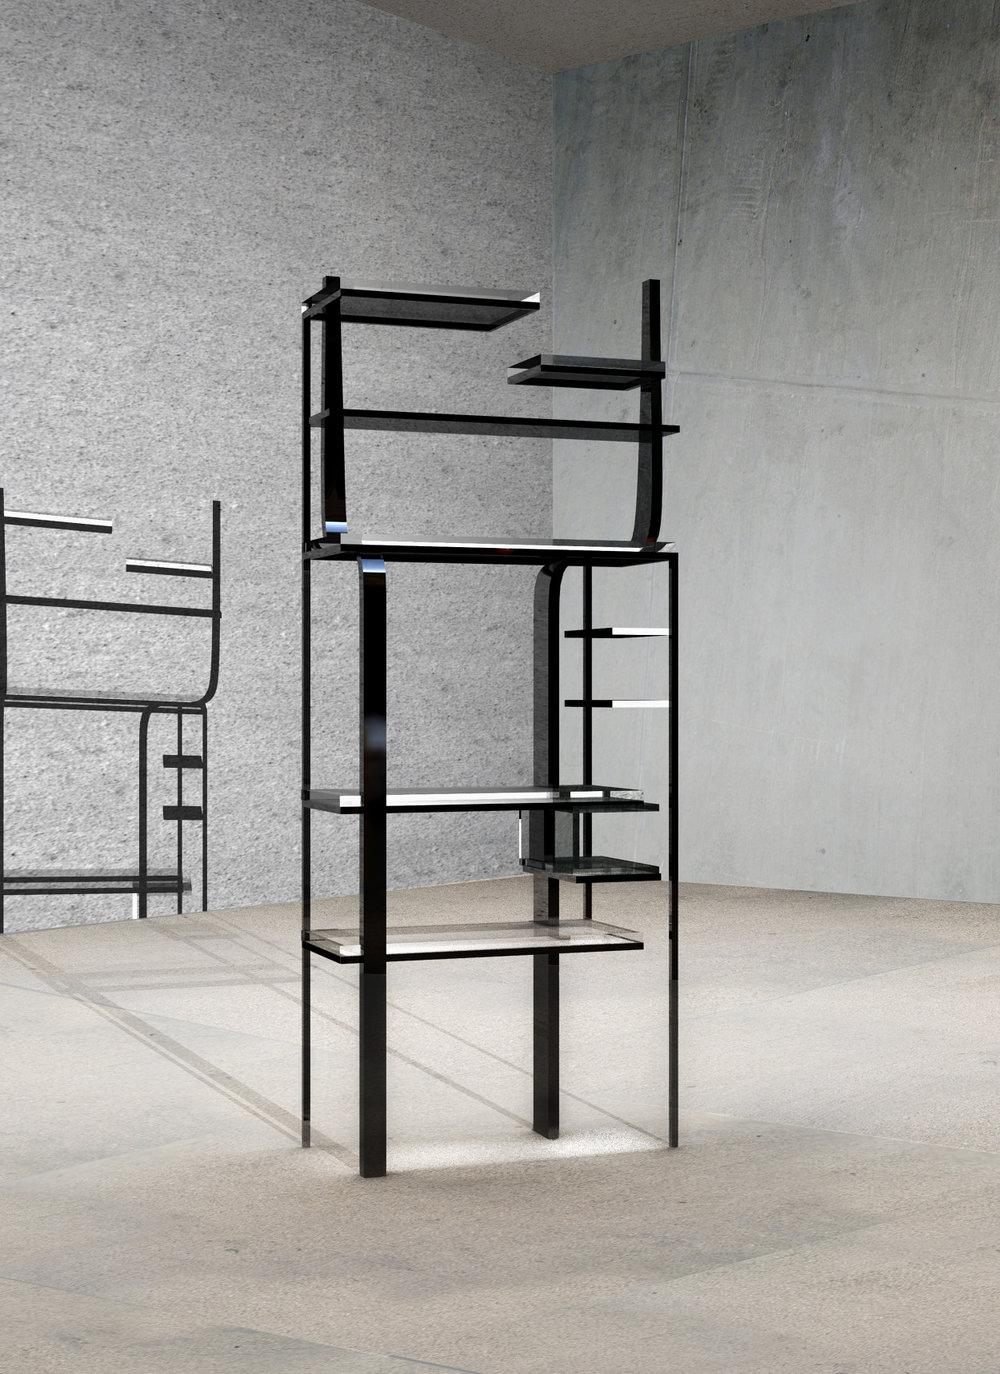 Andrea-Pena-Assignmnet--2-sculpture-cabinet-final_1250.jpg